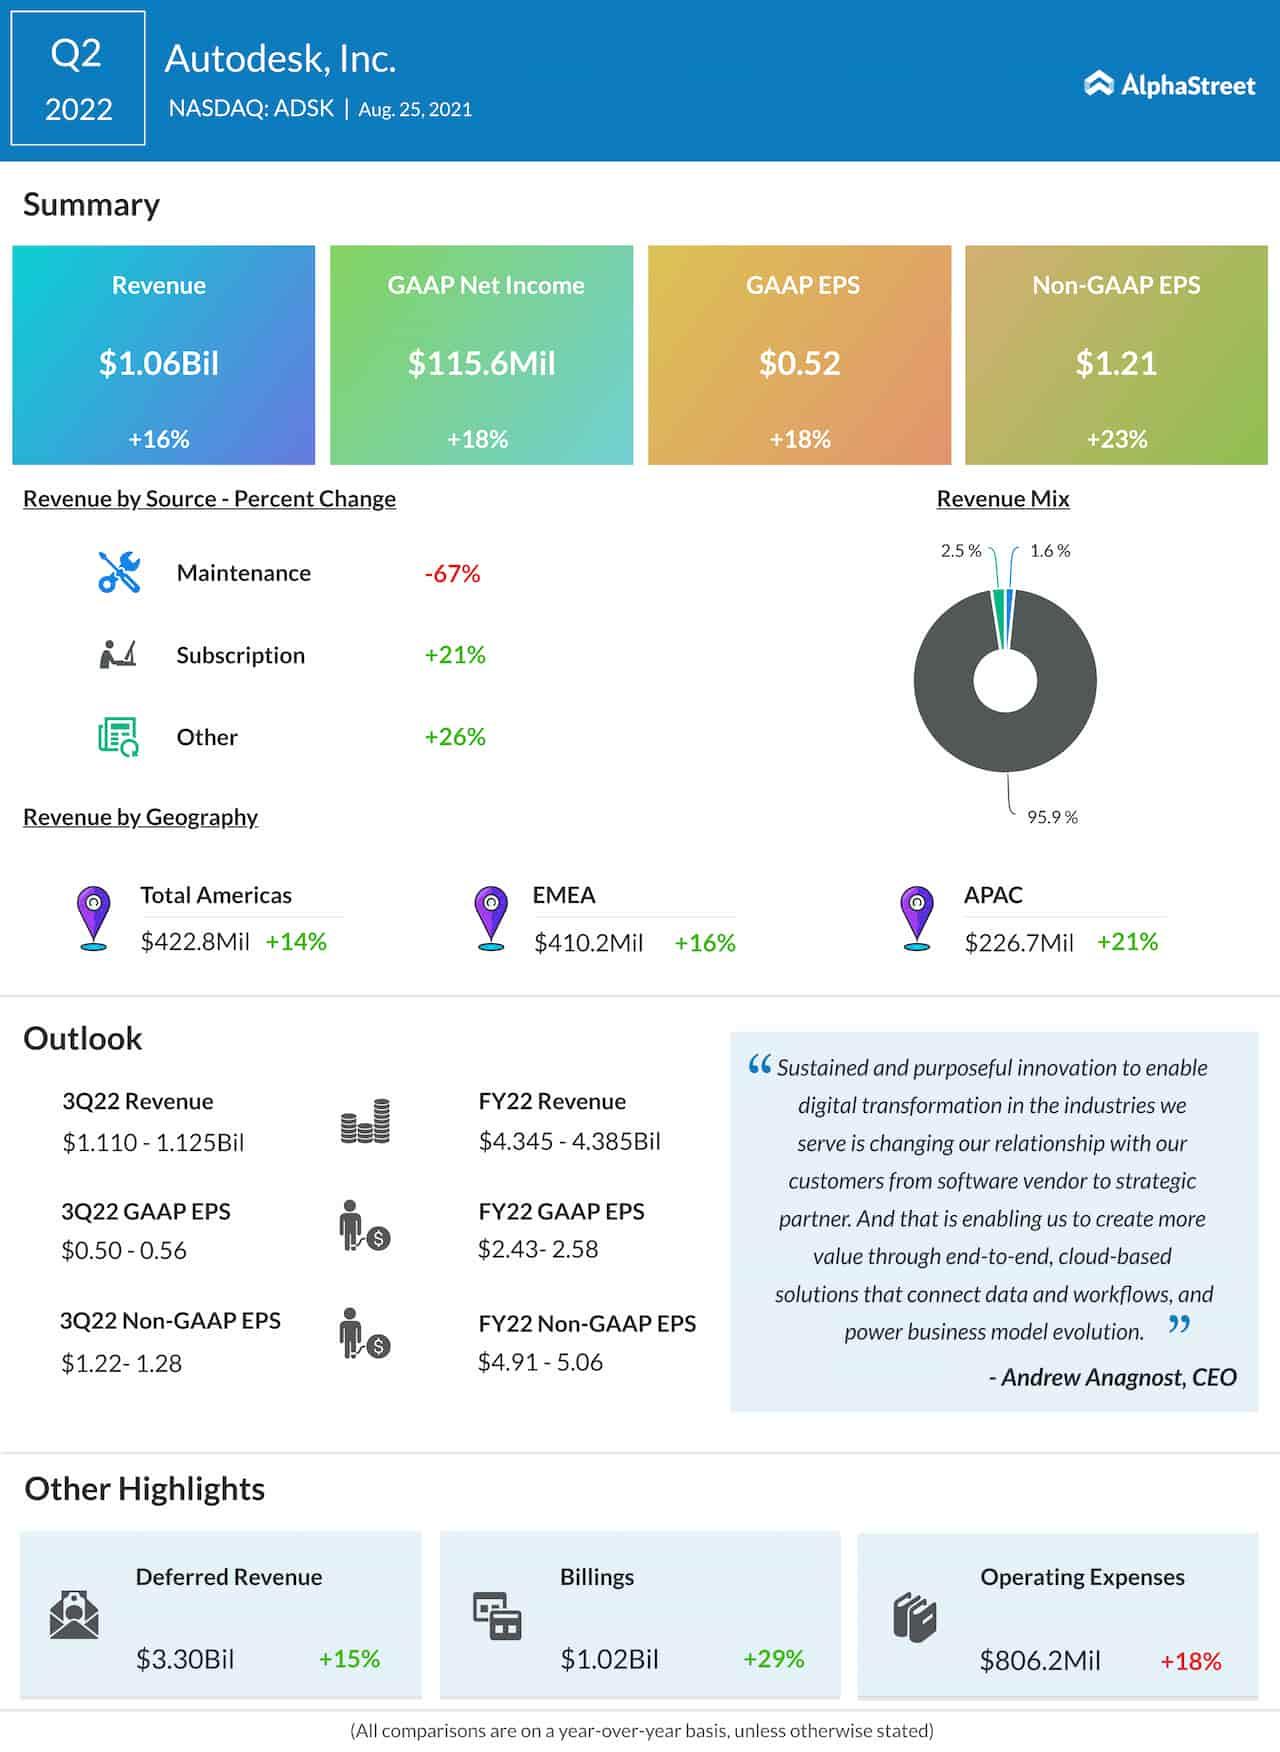 Autodesk Q2 2022 earnings infographic